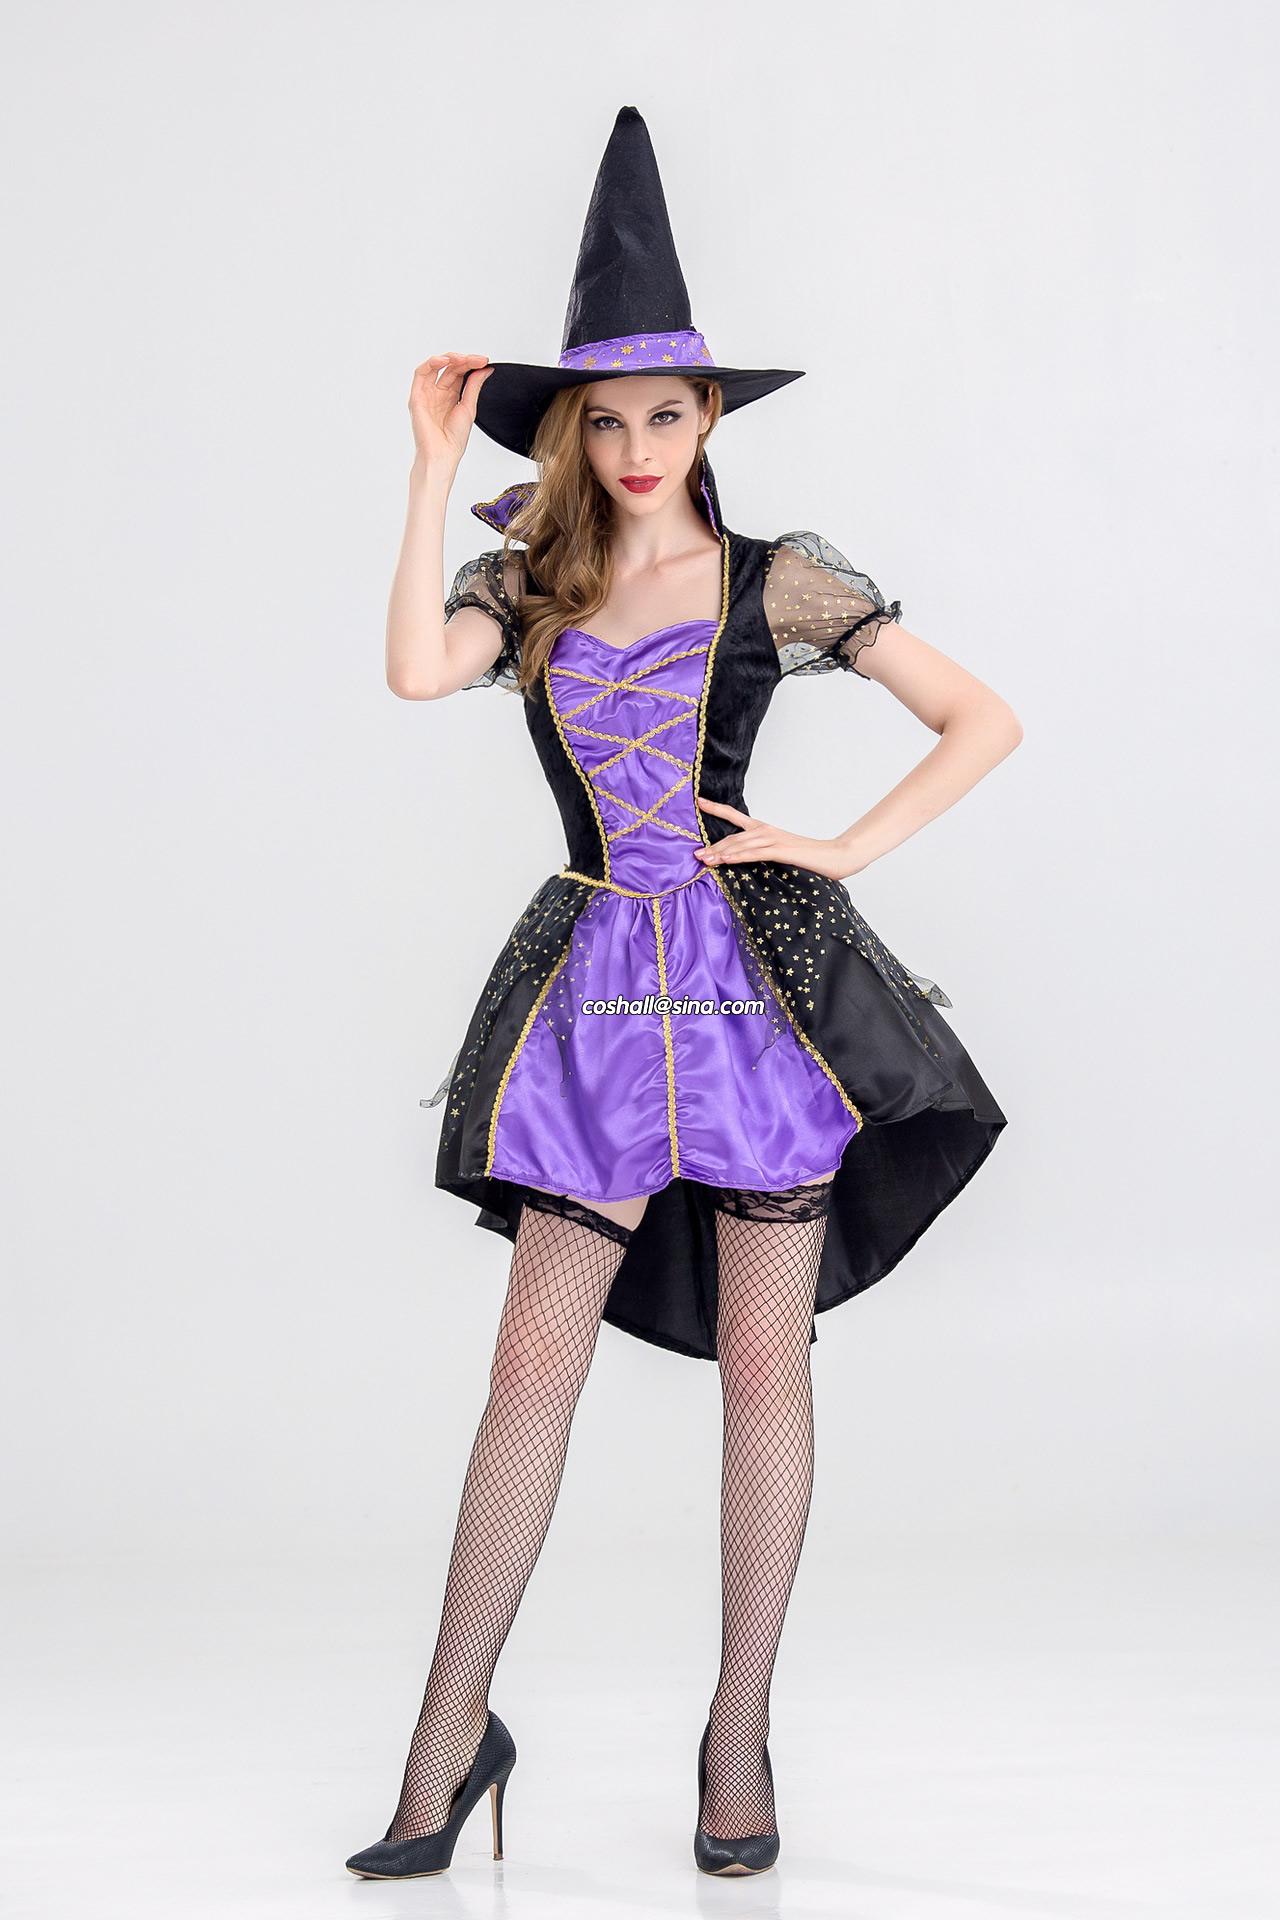 Wick Costume